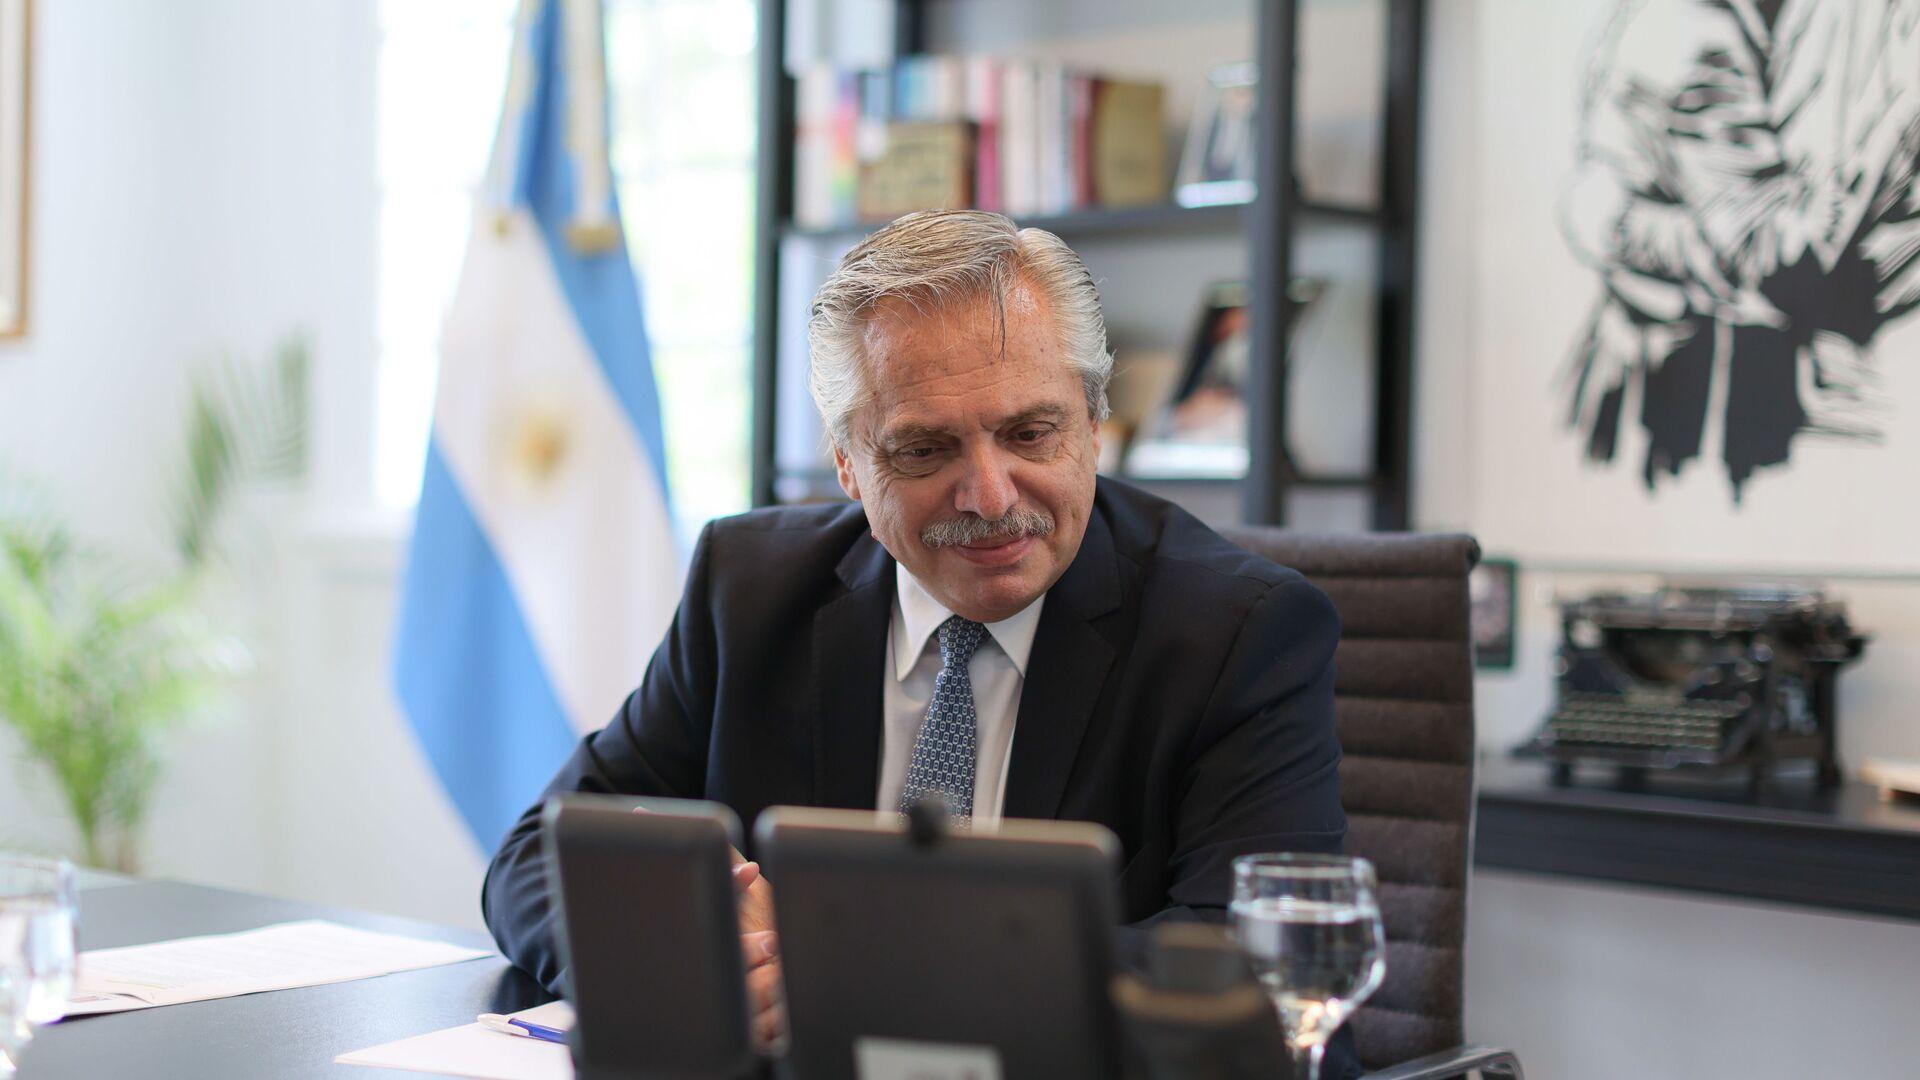 Alberto Fernández, presidente de Argentina - Sputnik Mundo, 1920, 19.02.2021